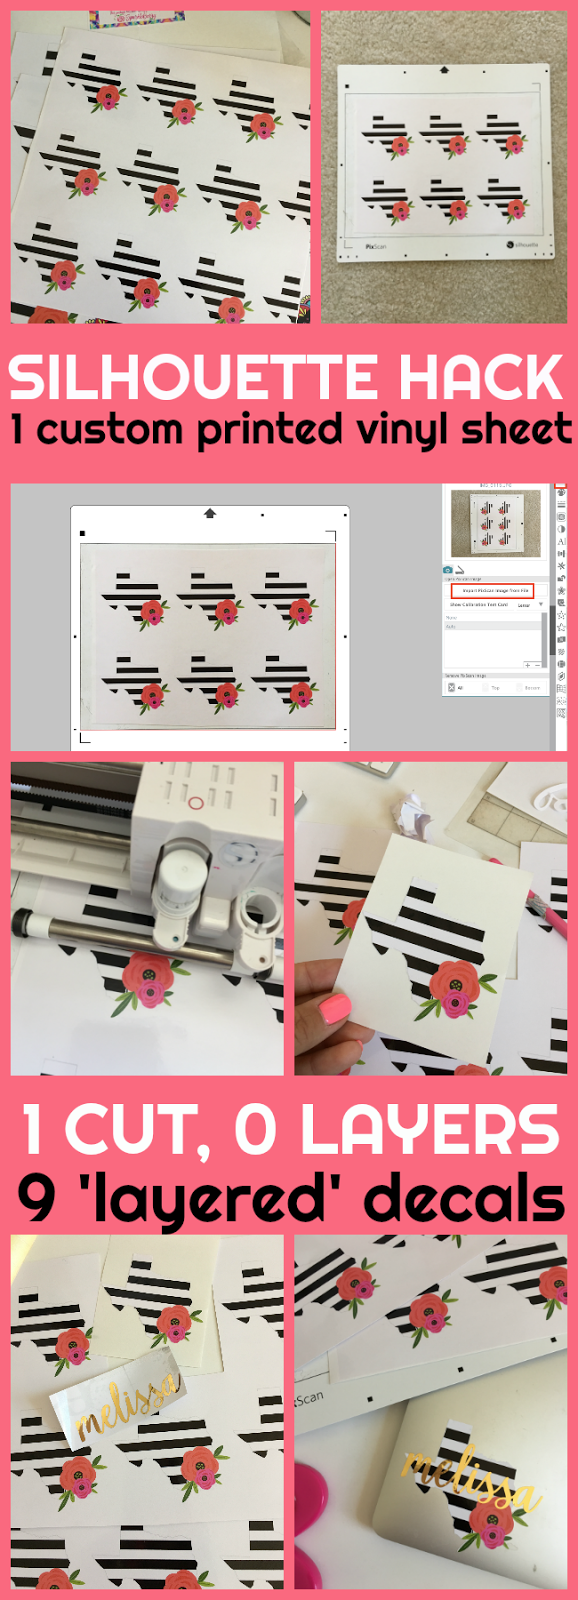 Print And Cut Bulk Vinyl Decals Using Sparkle Berry Inks Upload - Custom vinyl decals upload image